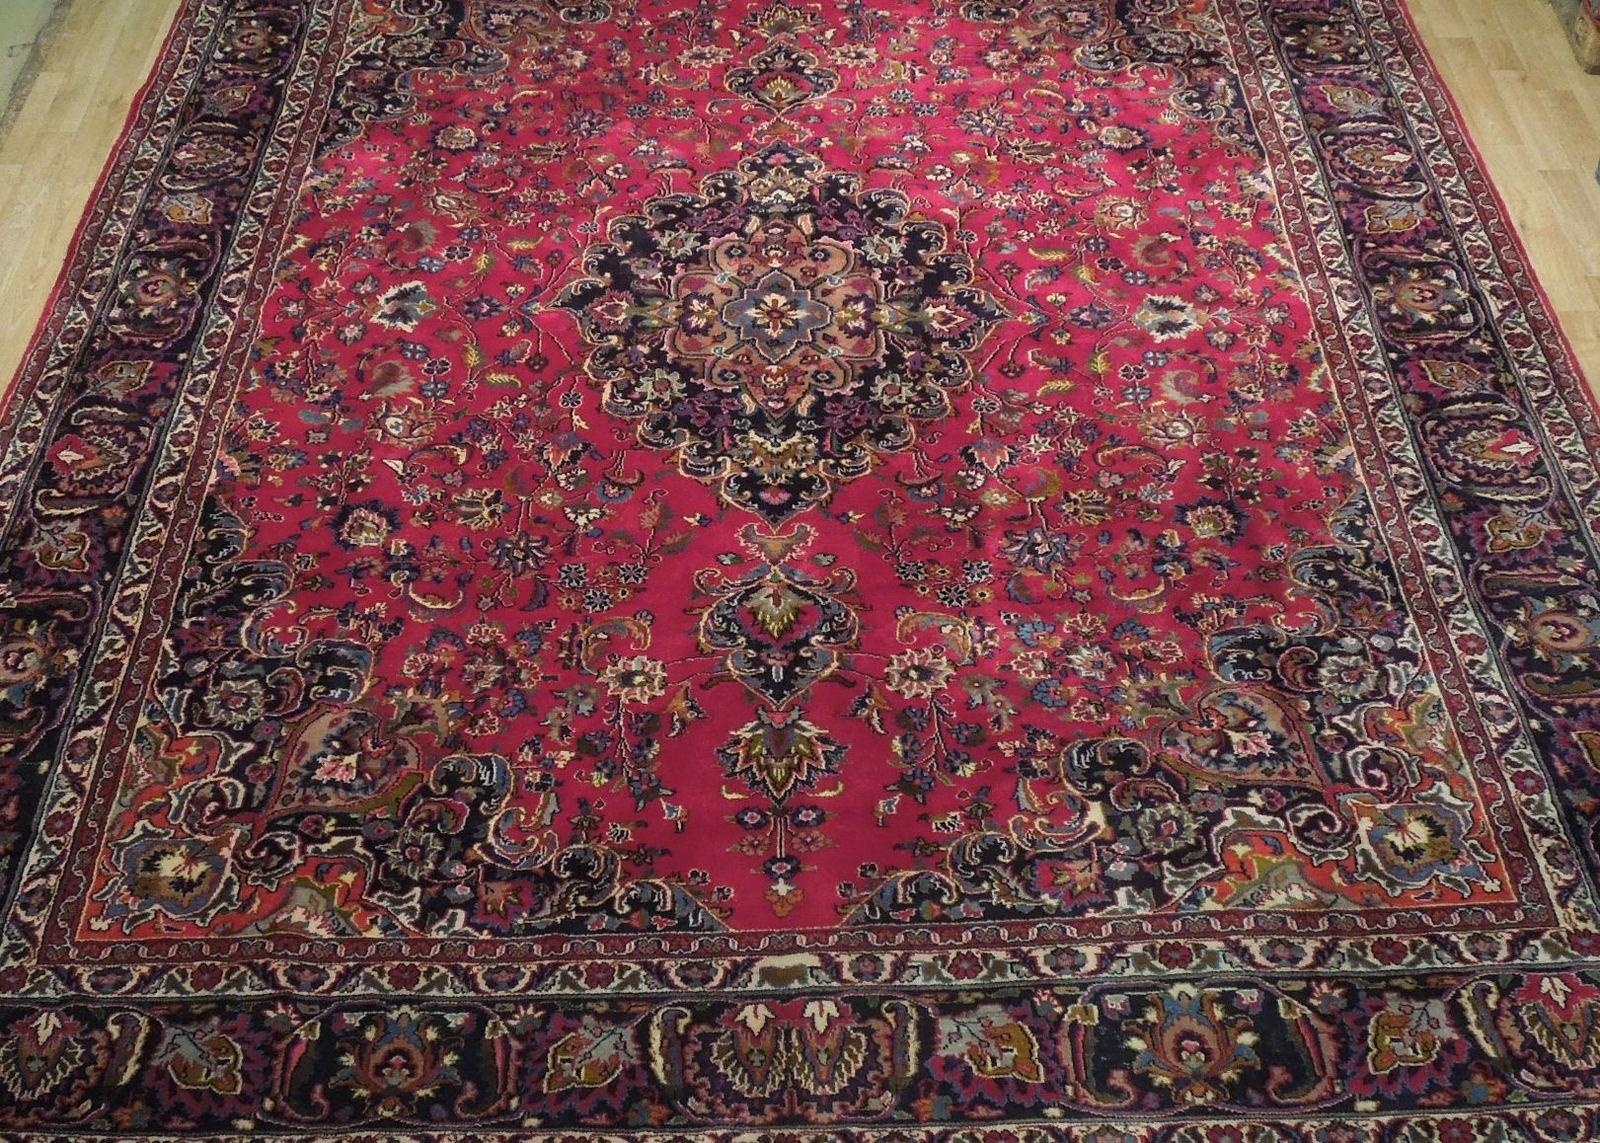 Red Wool Rug 10' x 12' Scarlet Vivid Original Traditional Persian Handmade Rug image 12